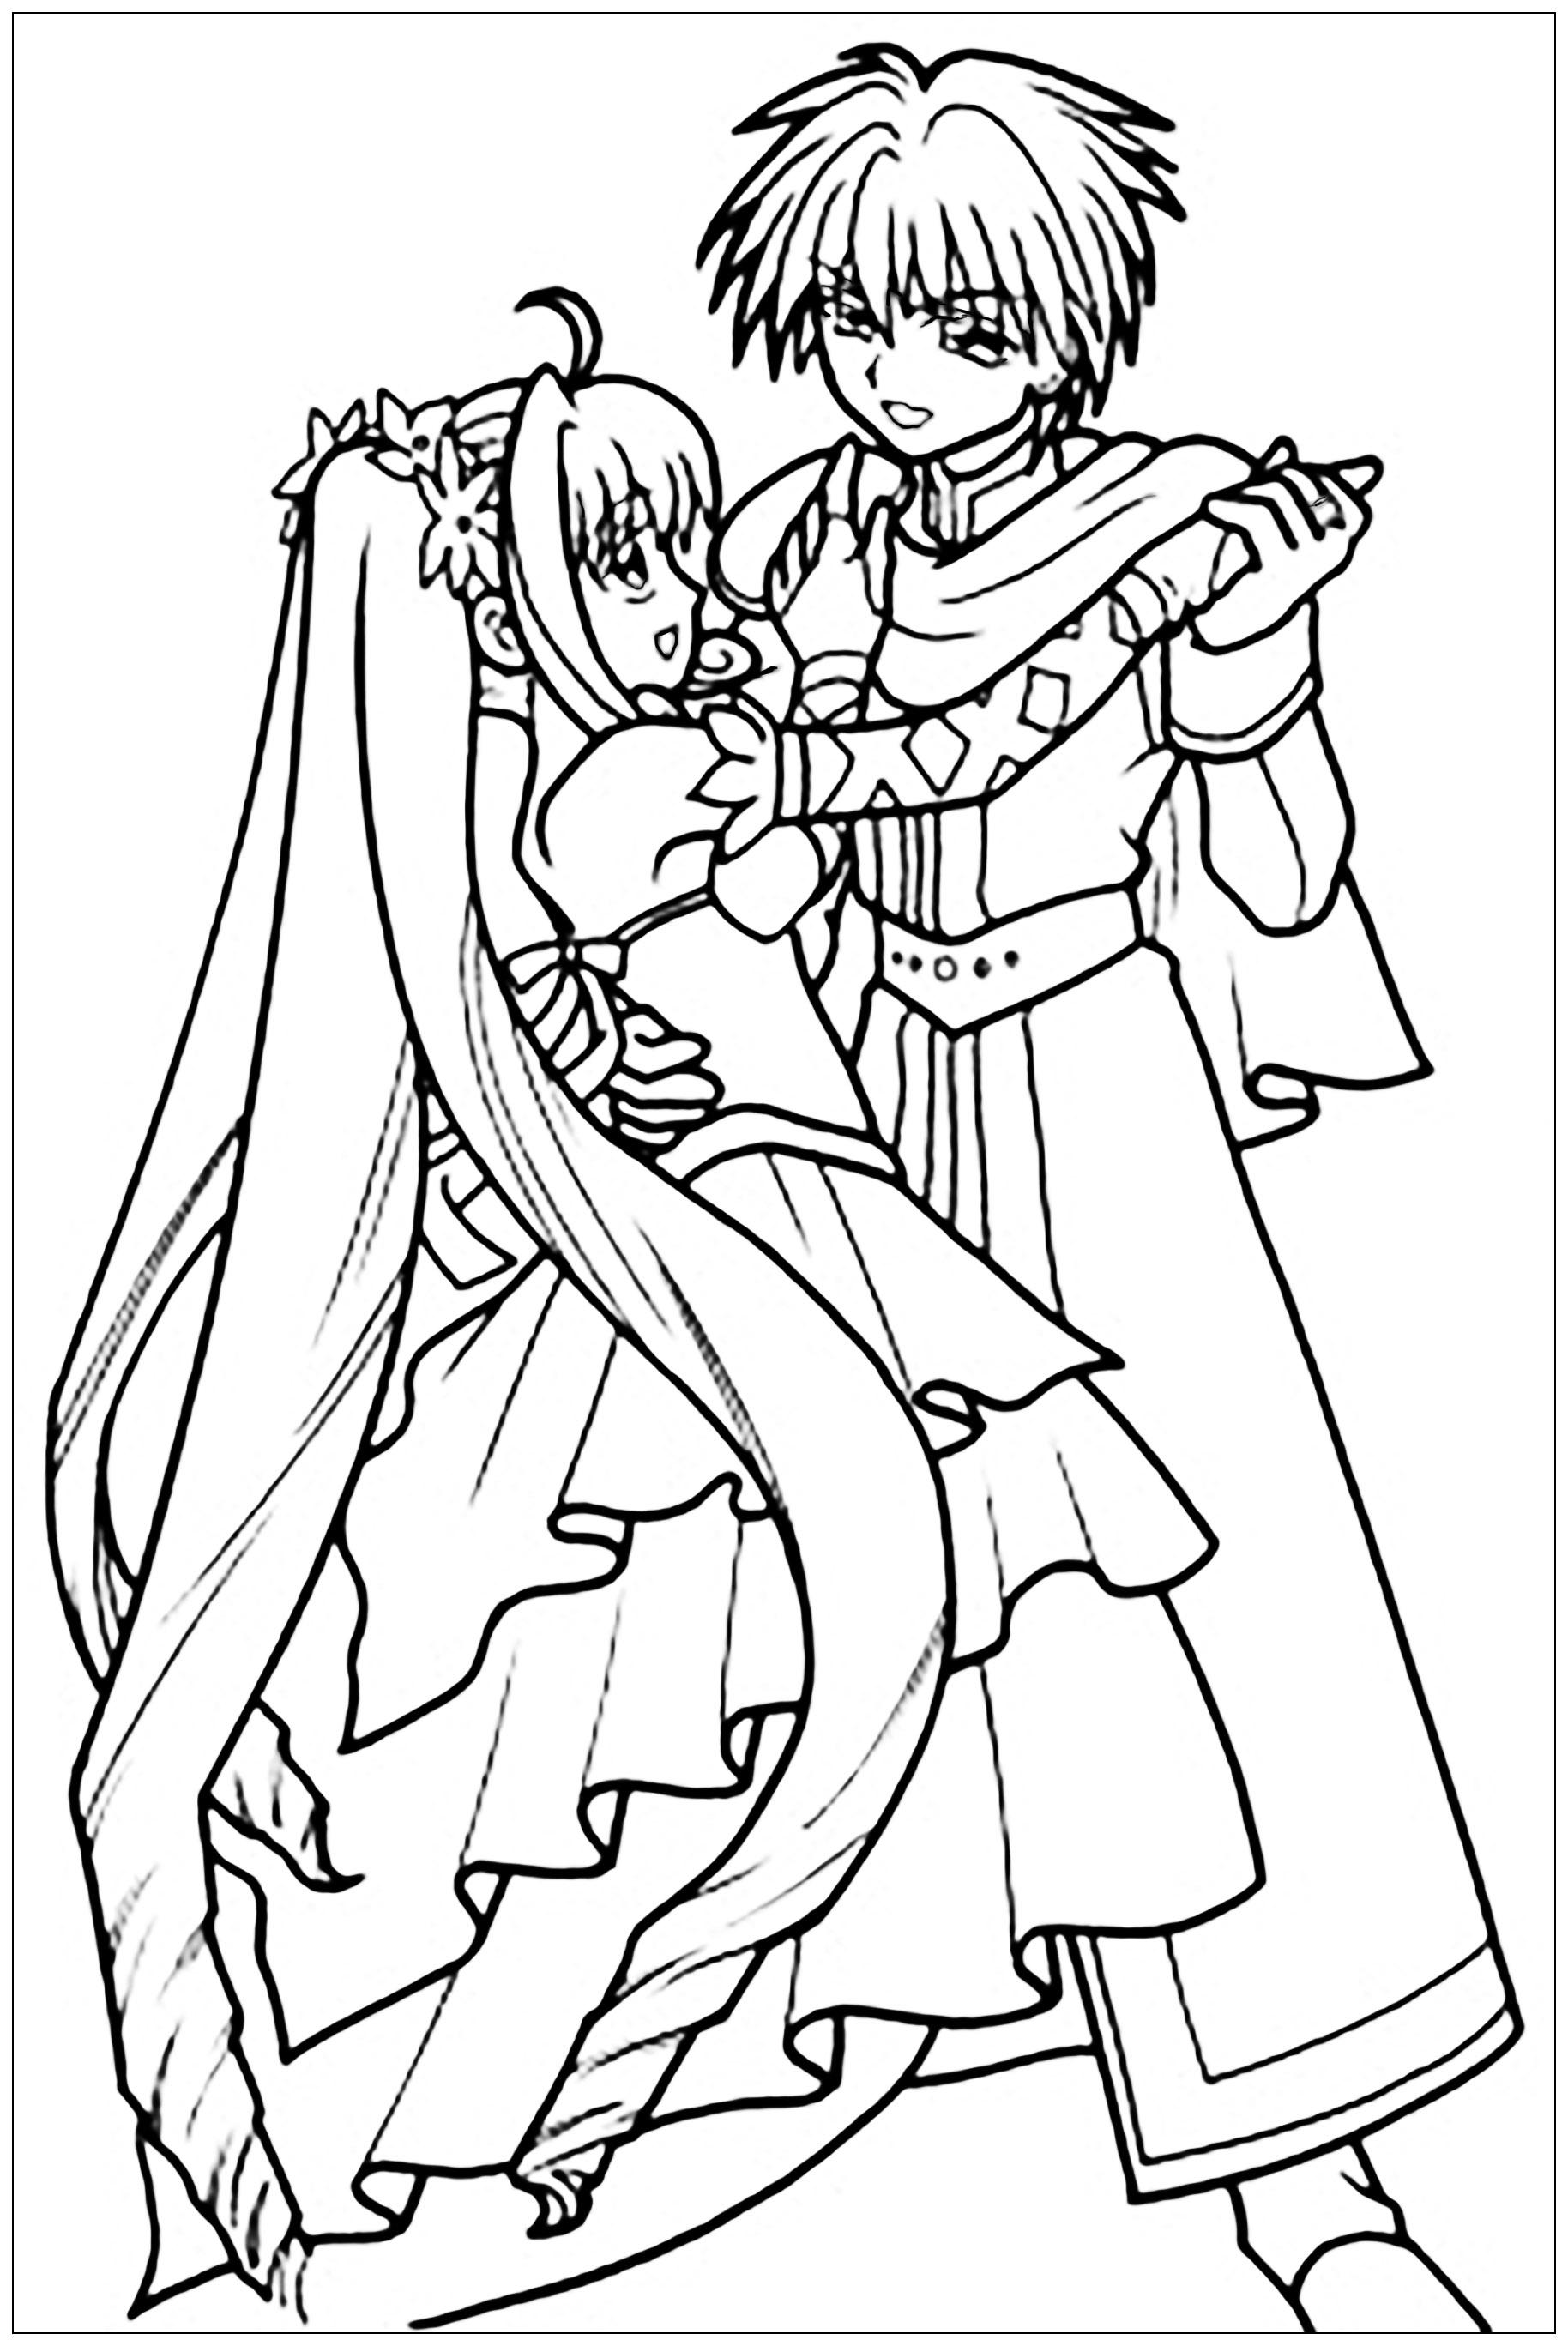 Manga Danse En Robe Et Costume - Divers Animes Et Mangas destiné Coloriage Manga Kawaii